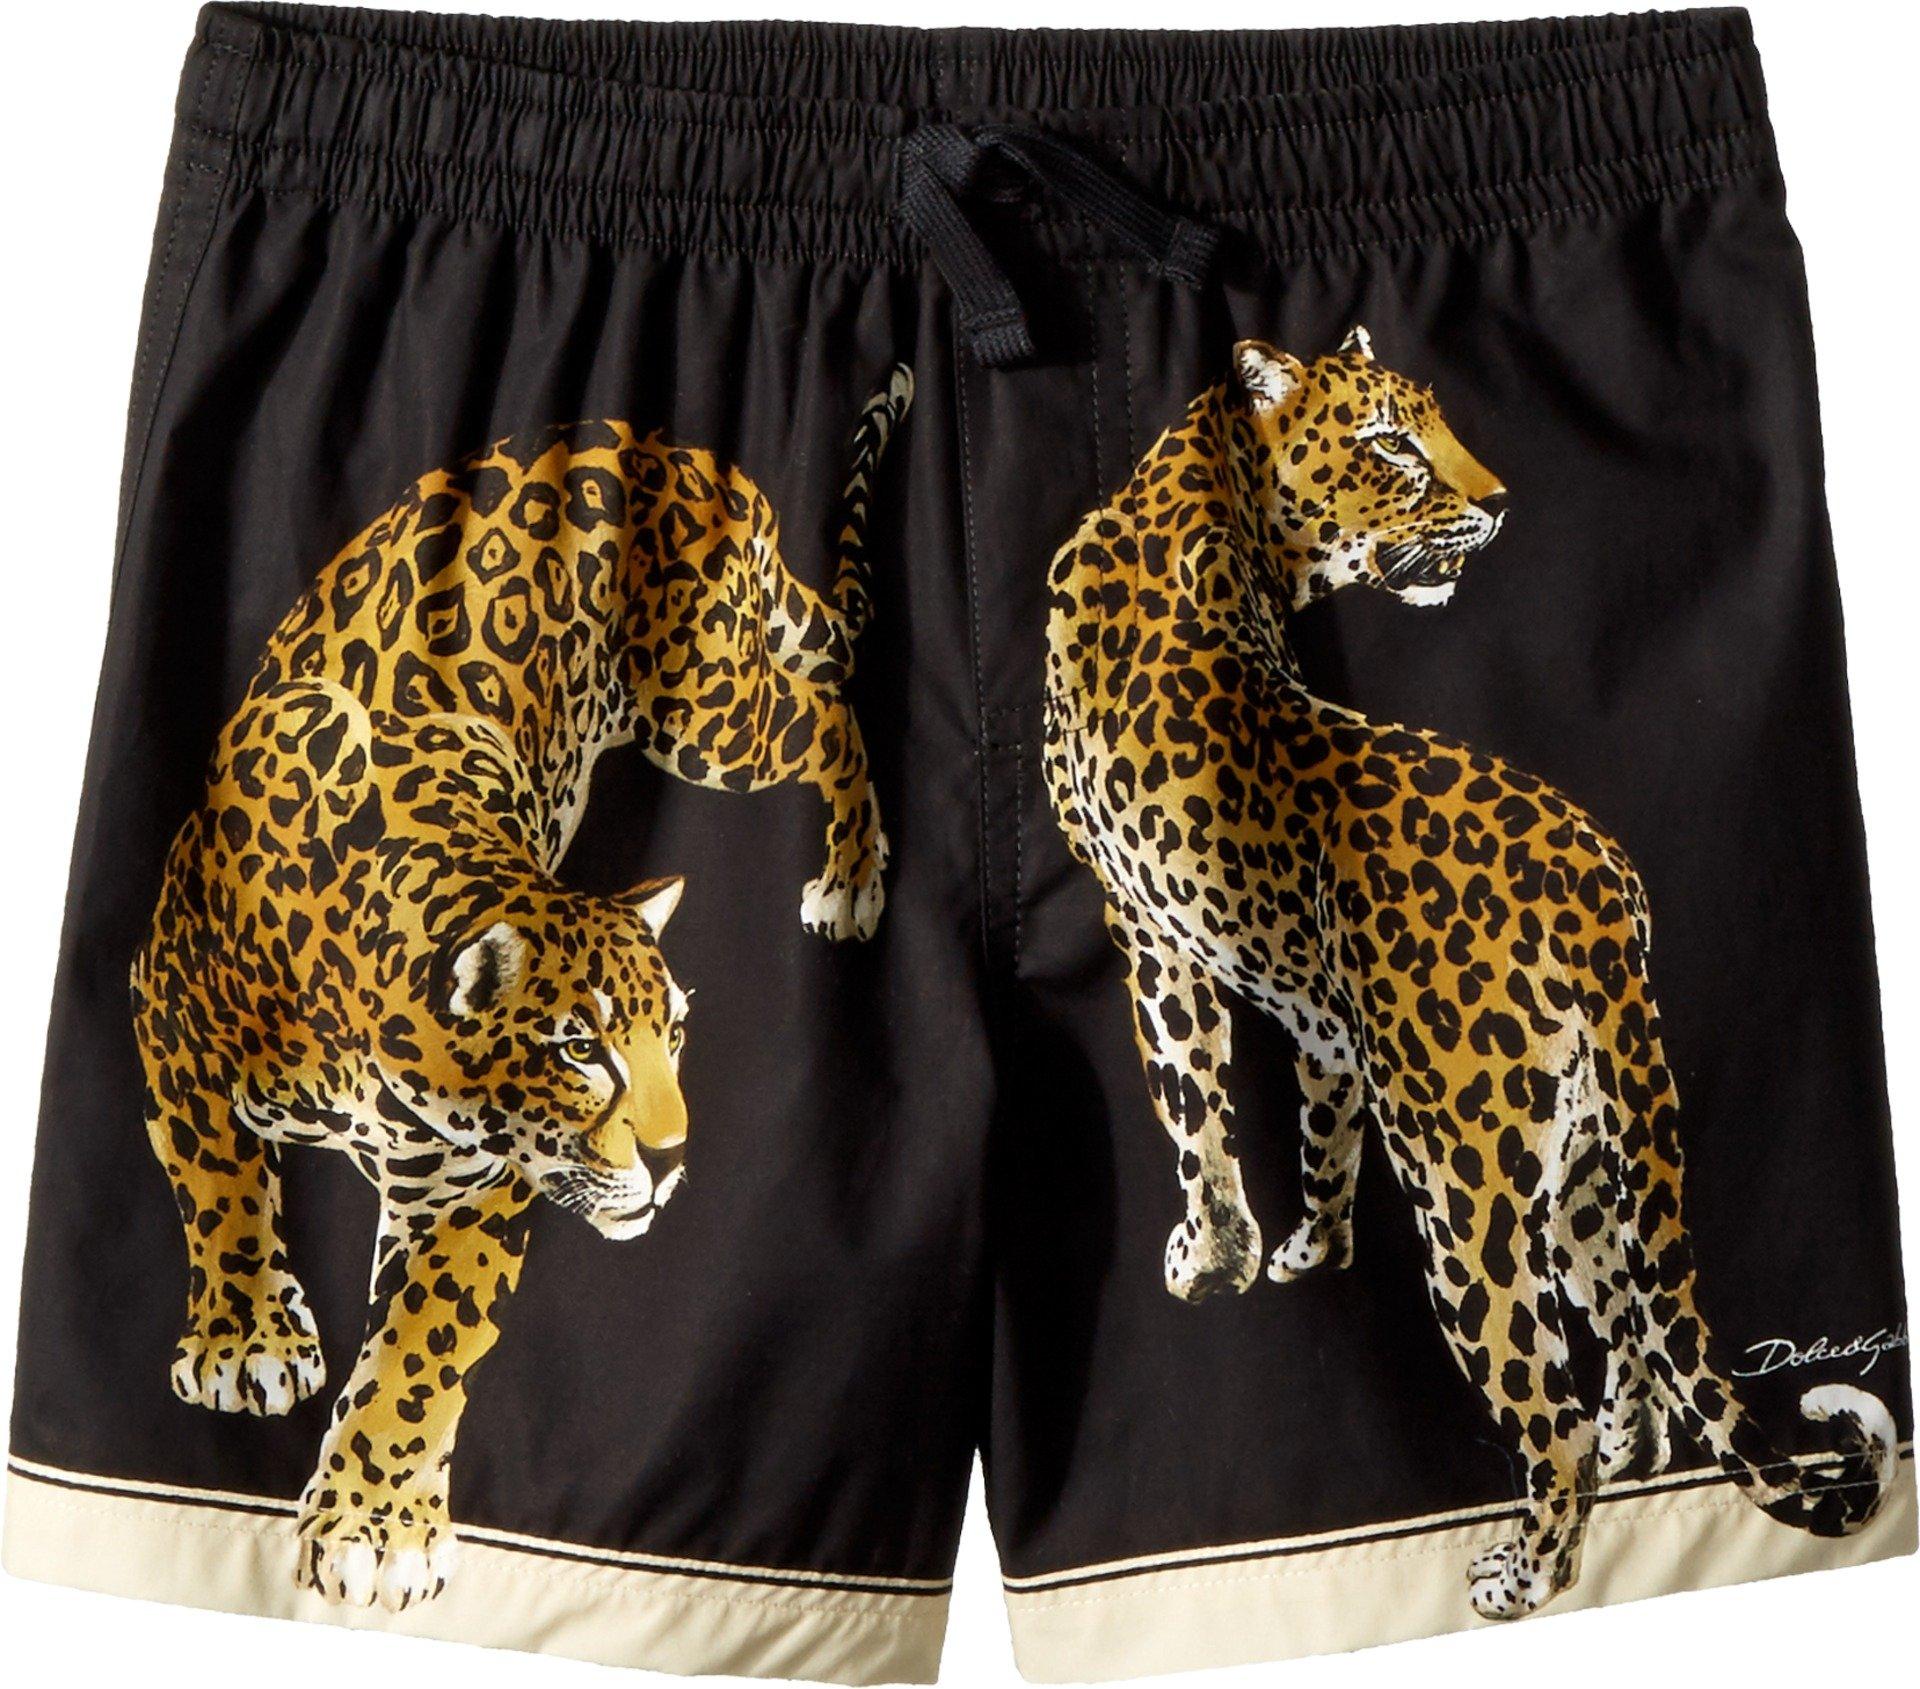 Dolce & Gabbana Kids Baby Boy's Shorts (Toddler/Little Kids) Black Leopard Print 5 by Dolce & Gabbana (Image #1)